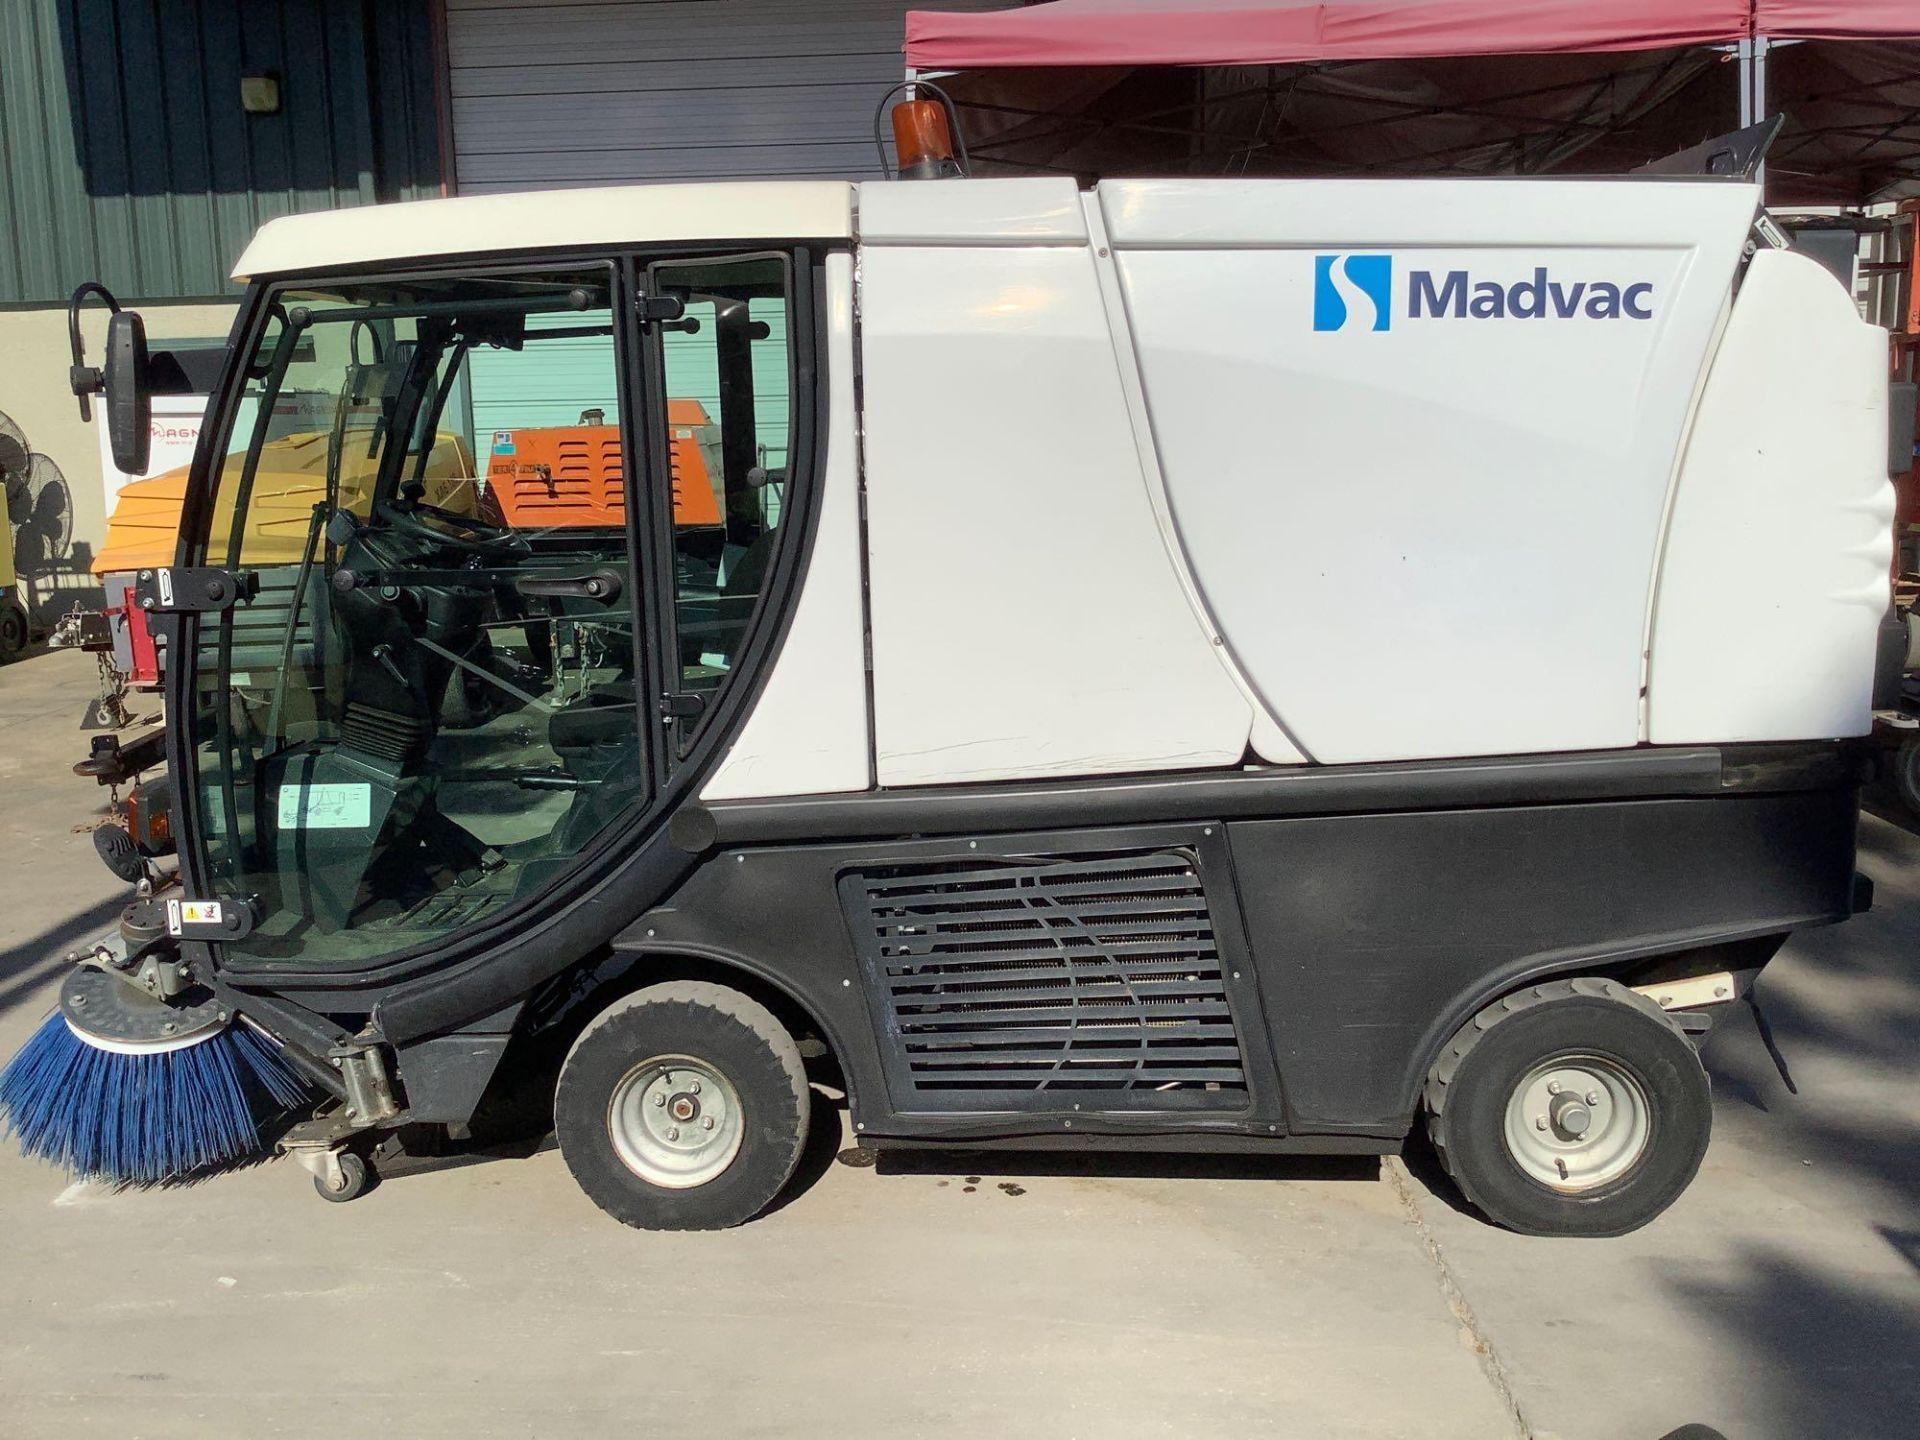 MADVAC COMPACT SWEEPER MODEL LS100 ,ENCLOSED CAB,BACK UP CAMERA, A/C AIR, EXTRA KEY - Image 2 of 15